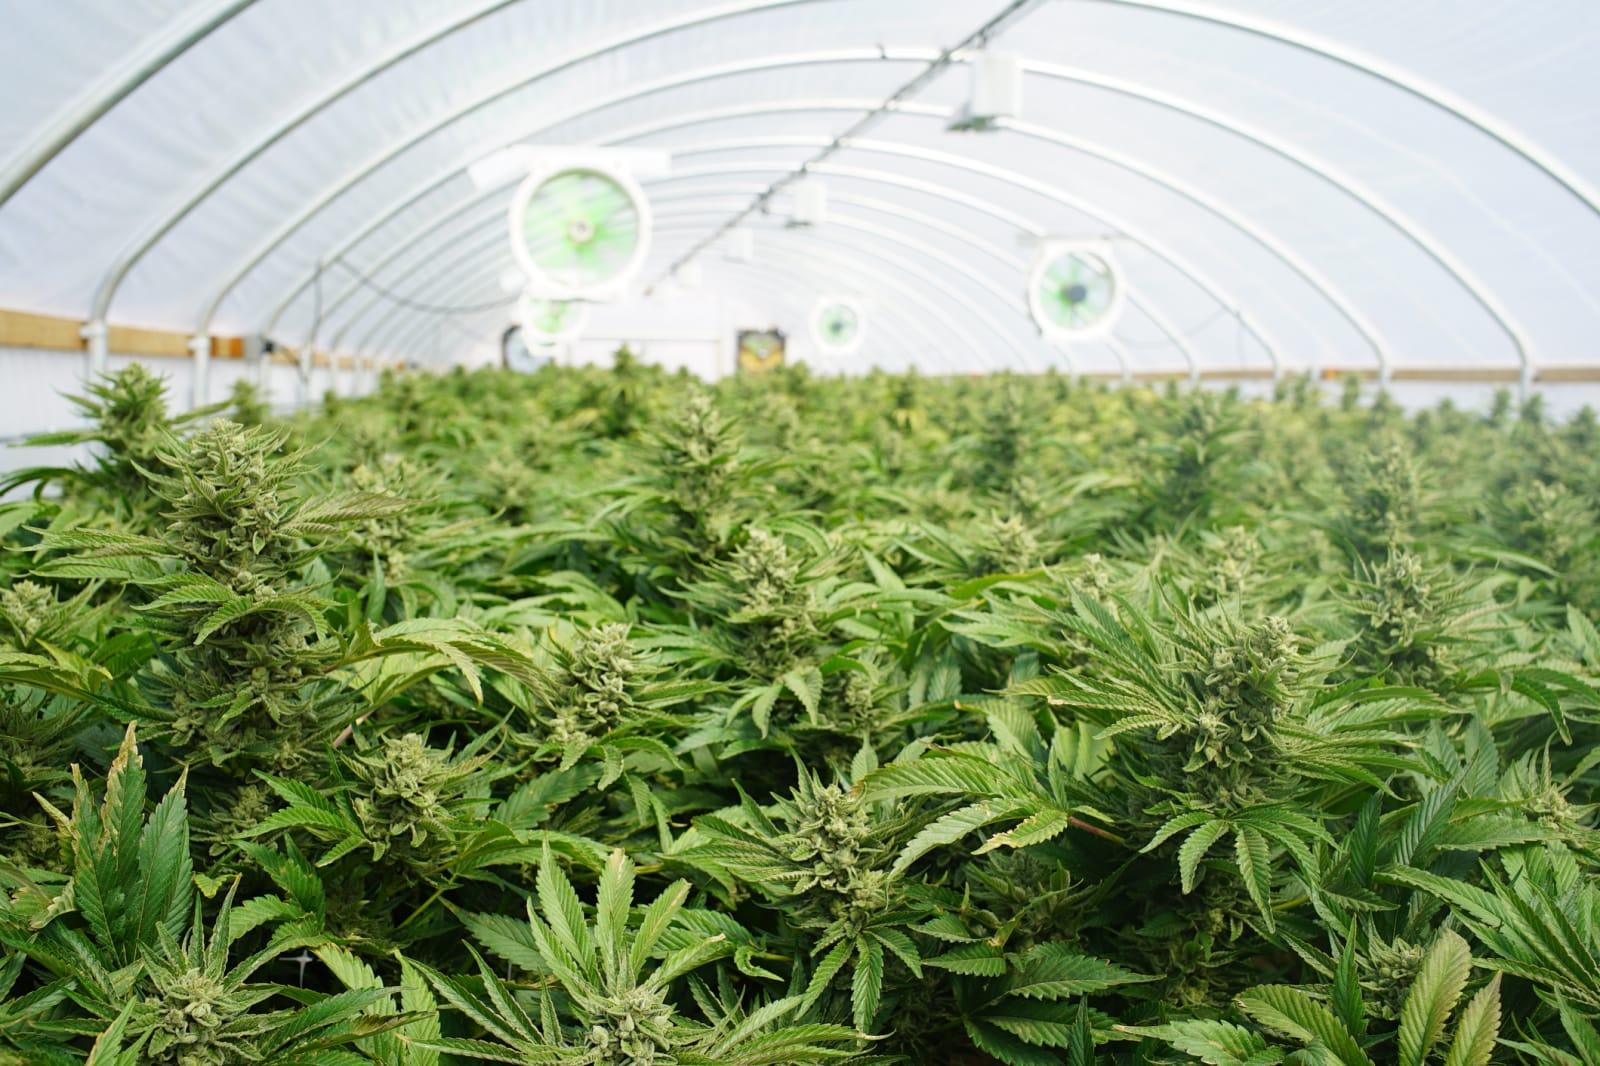 nevada site bug leaks medical marijuana applicant data